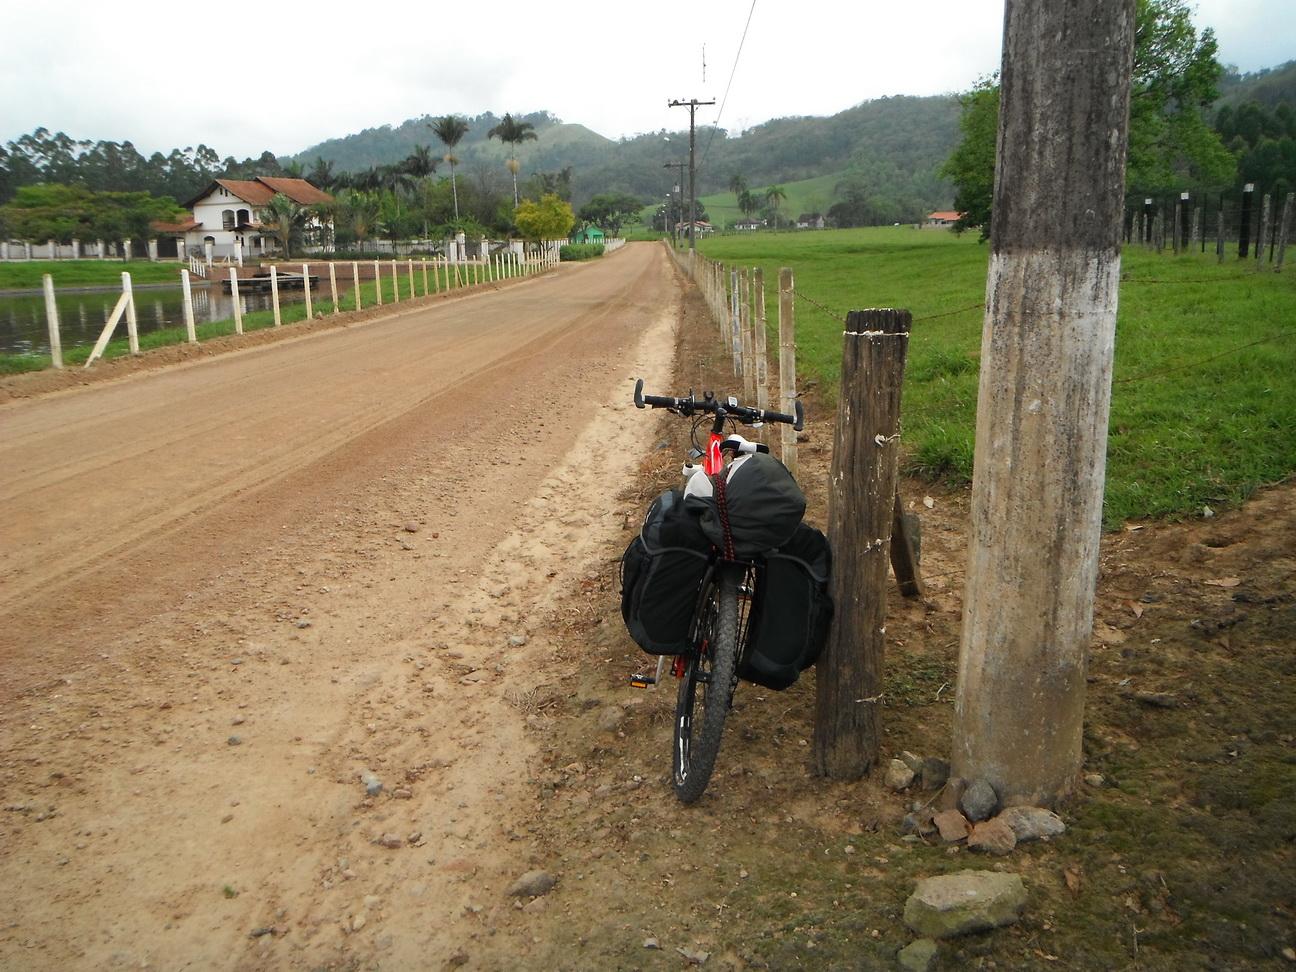 Circuito Vale Europeu : Natureza e pedaladas circuito vale europeu